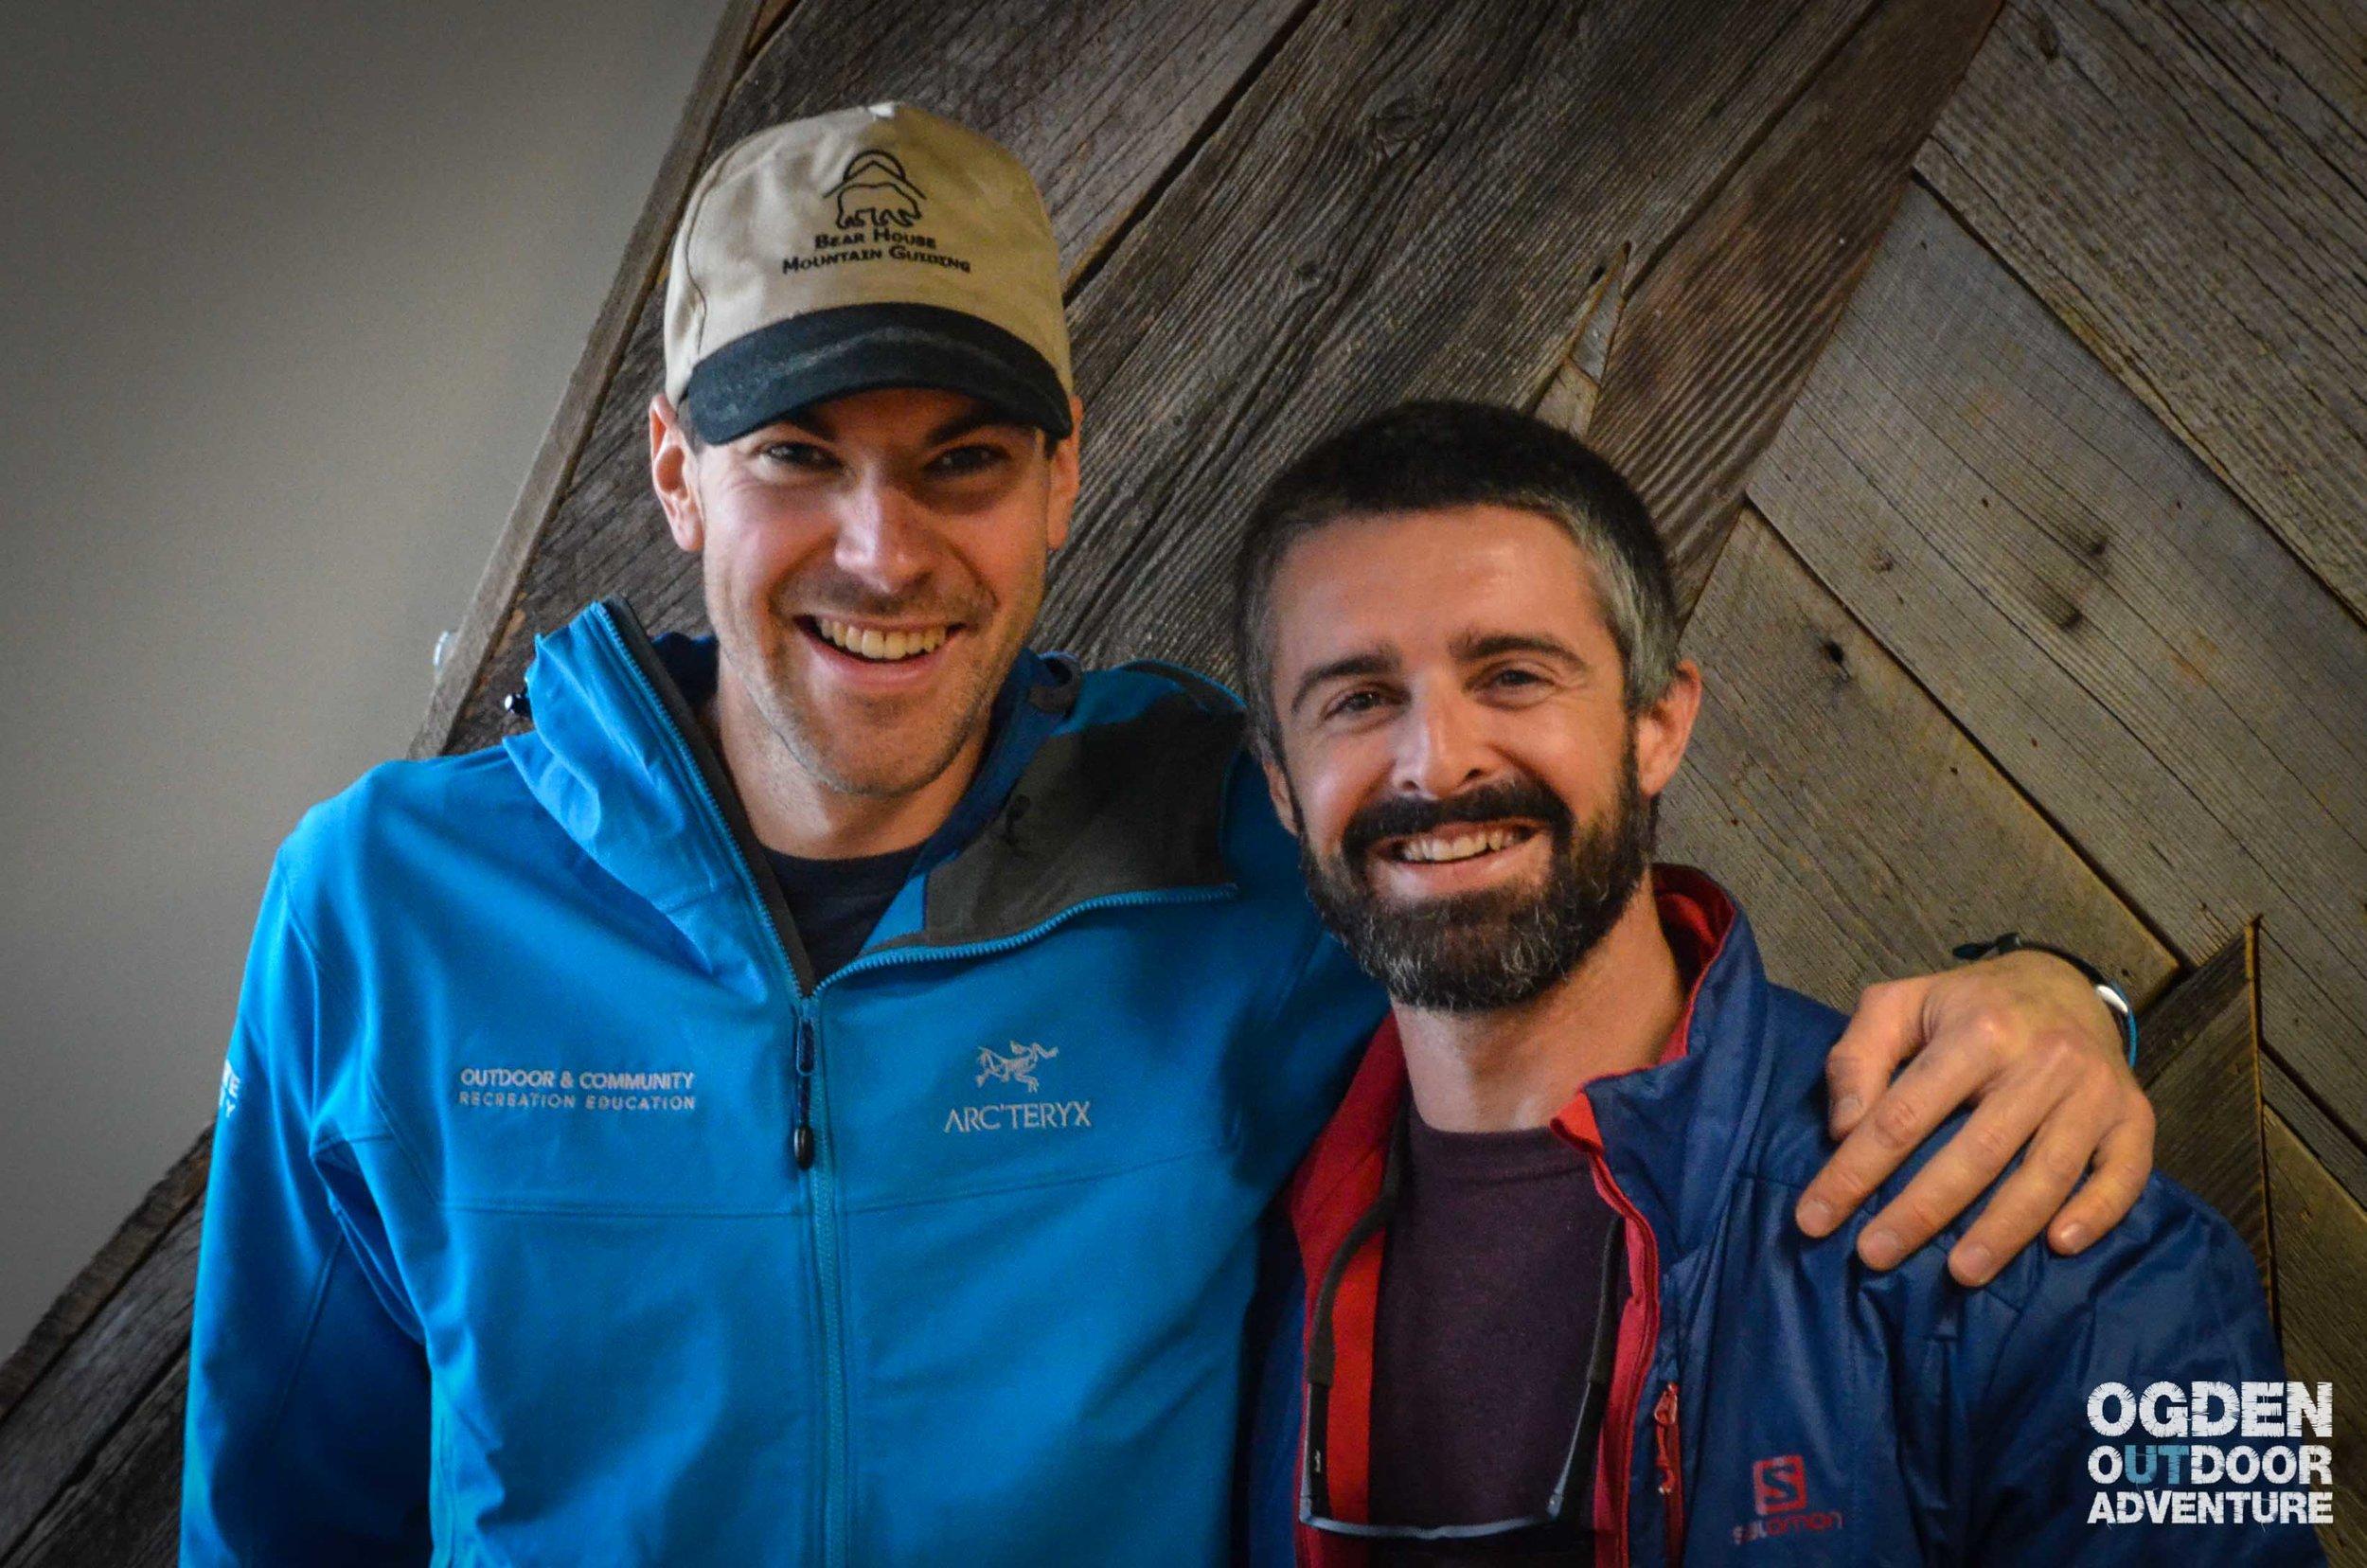 Derek DeBruin of Bear House Mountain Guiding and J.T. Robinson of Vertical Integration